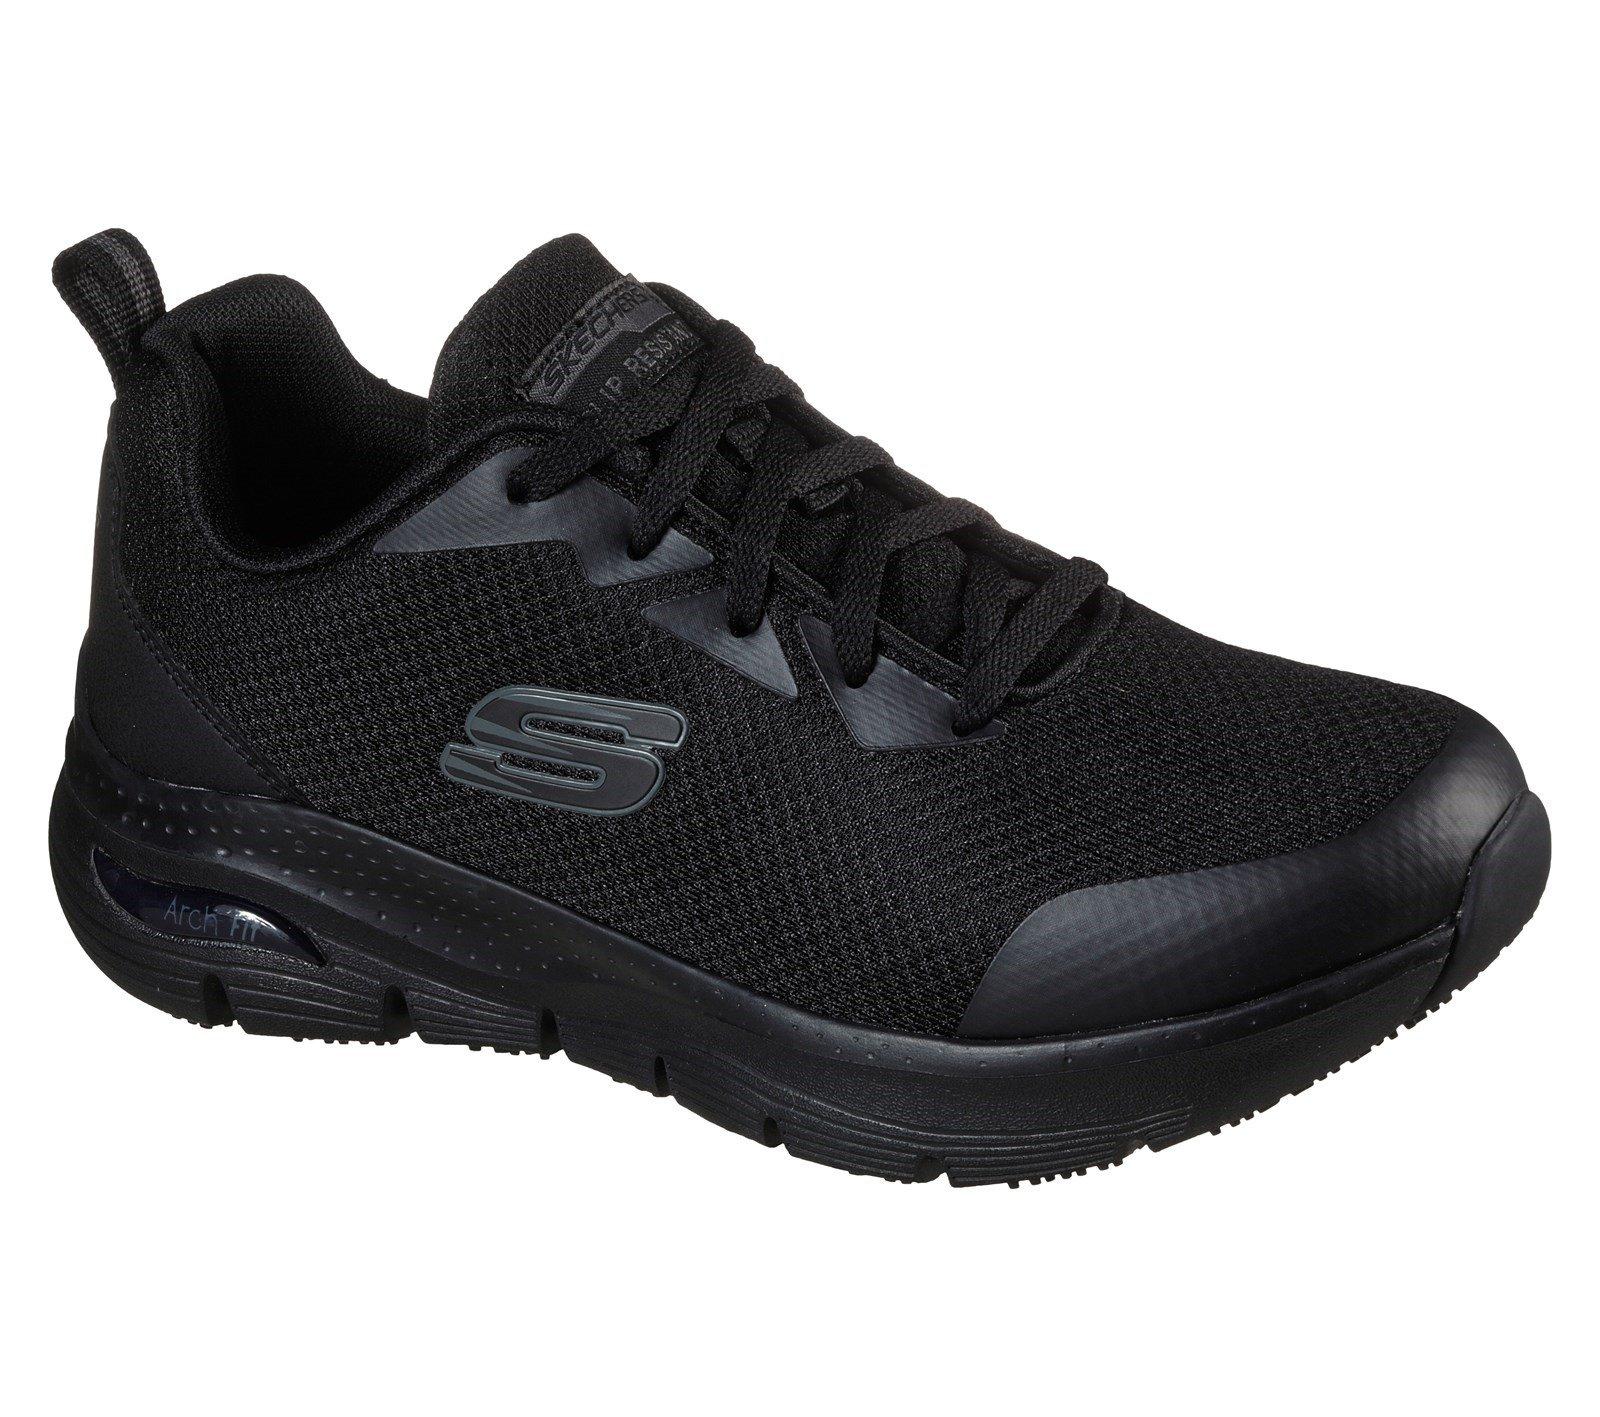 Skechers Women's Arch Fit Sr Trainer Black 32947 - Black 3